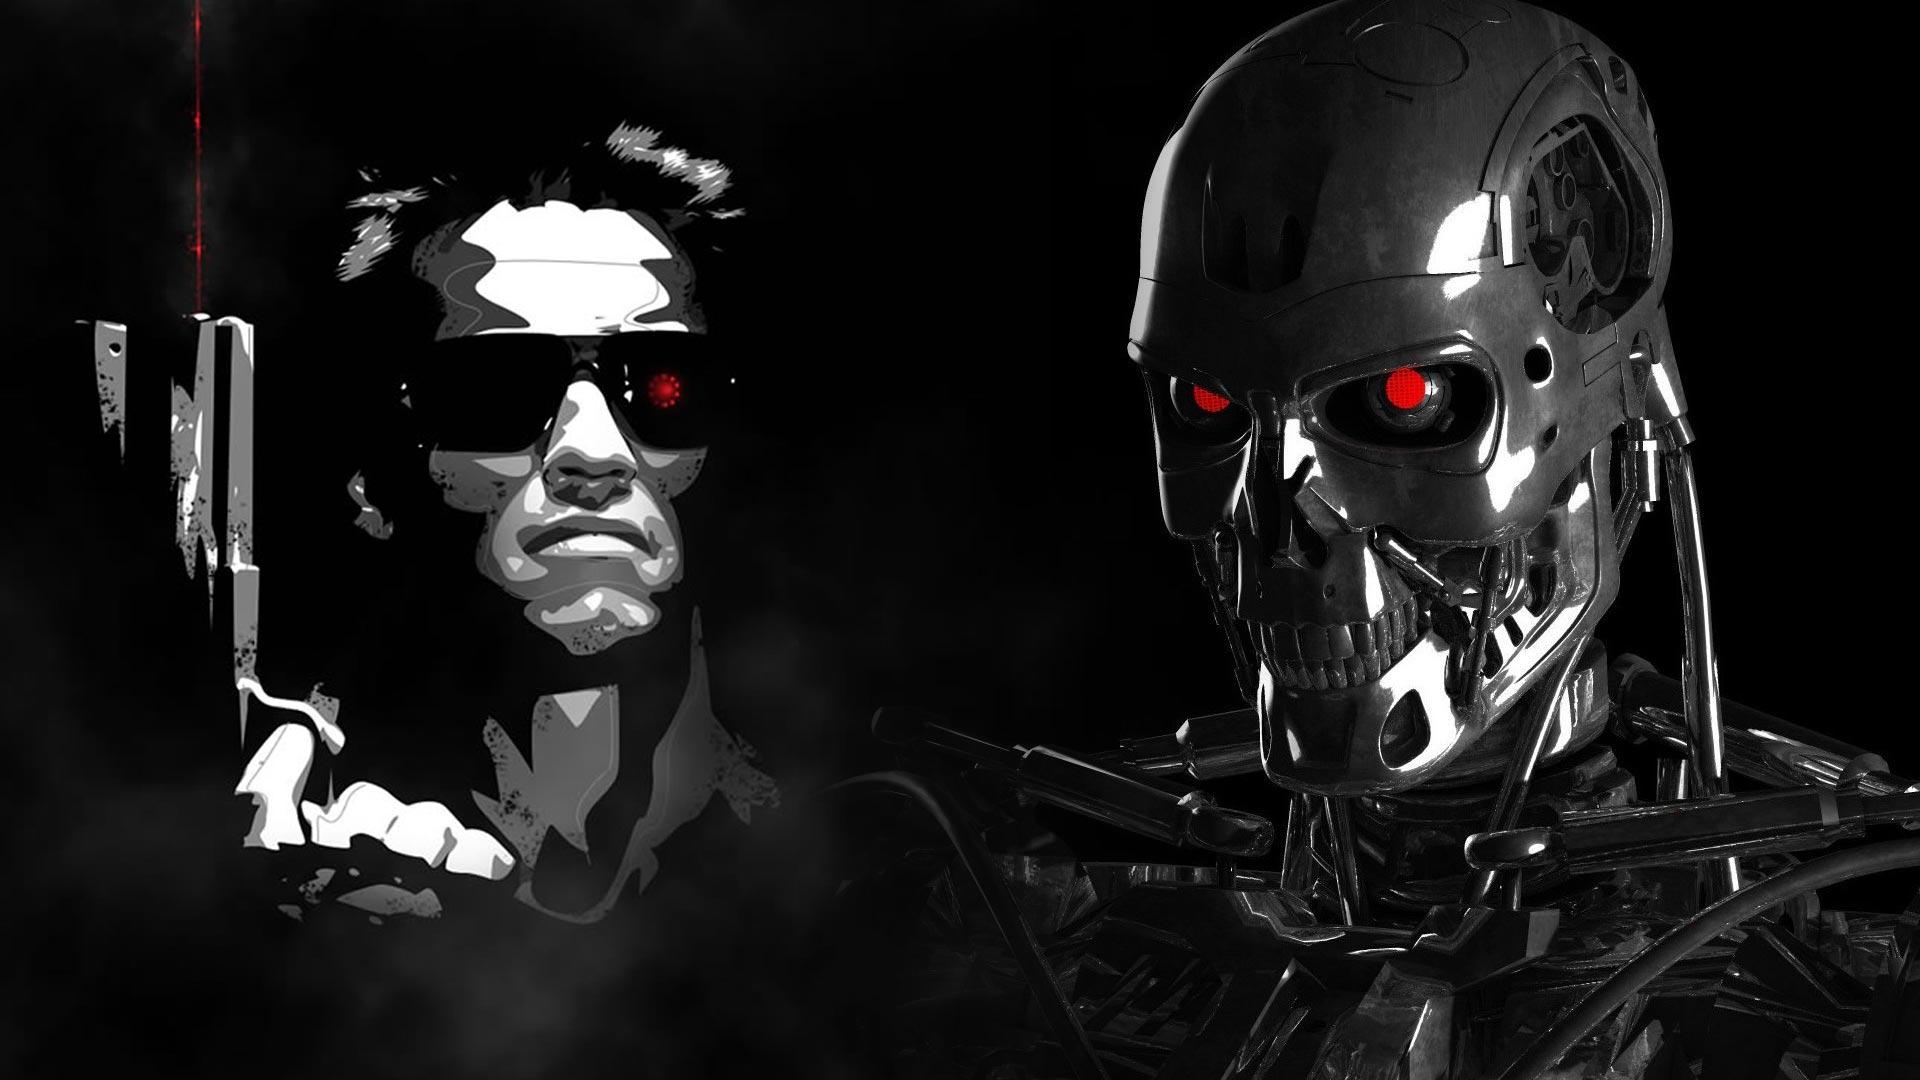 Death Race Cars Hd Wallpapers Arnold Schwarzenegger Confirmed For Terminator 5